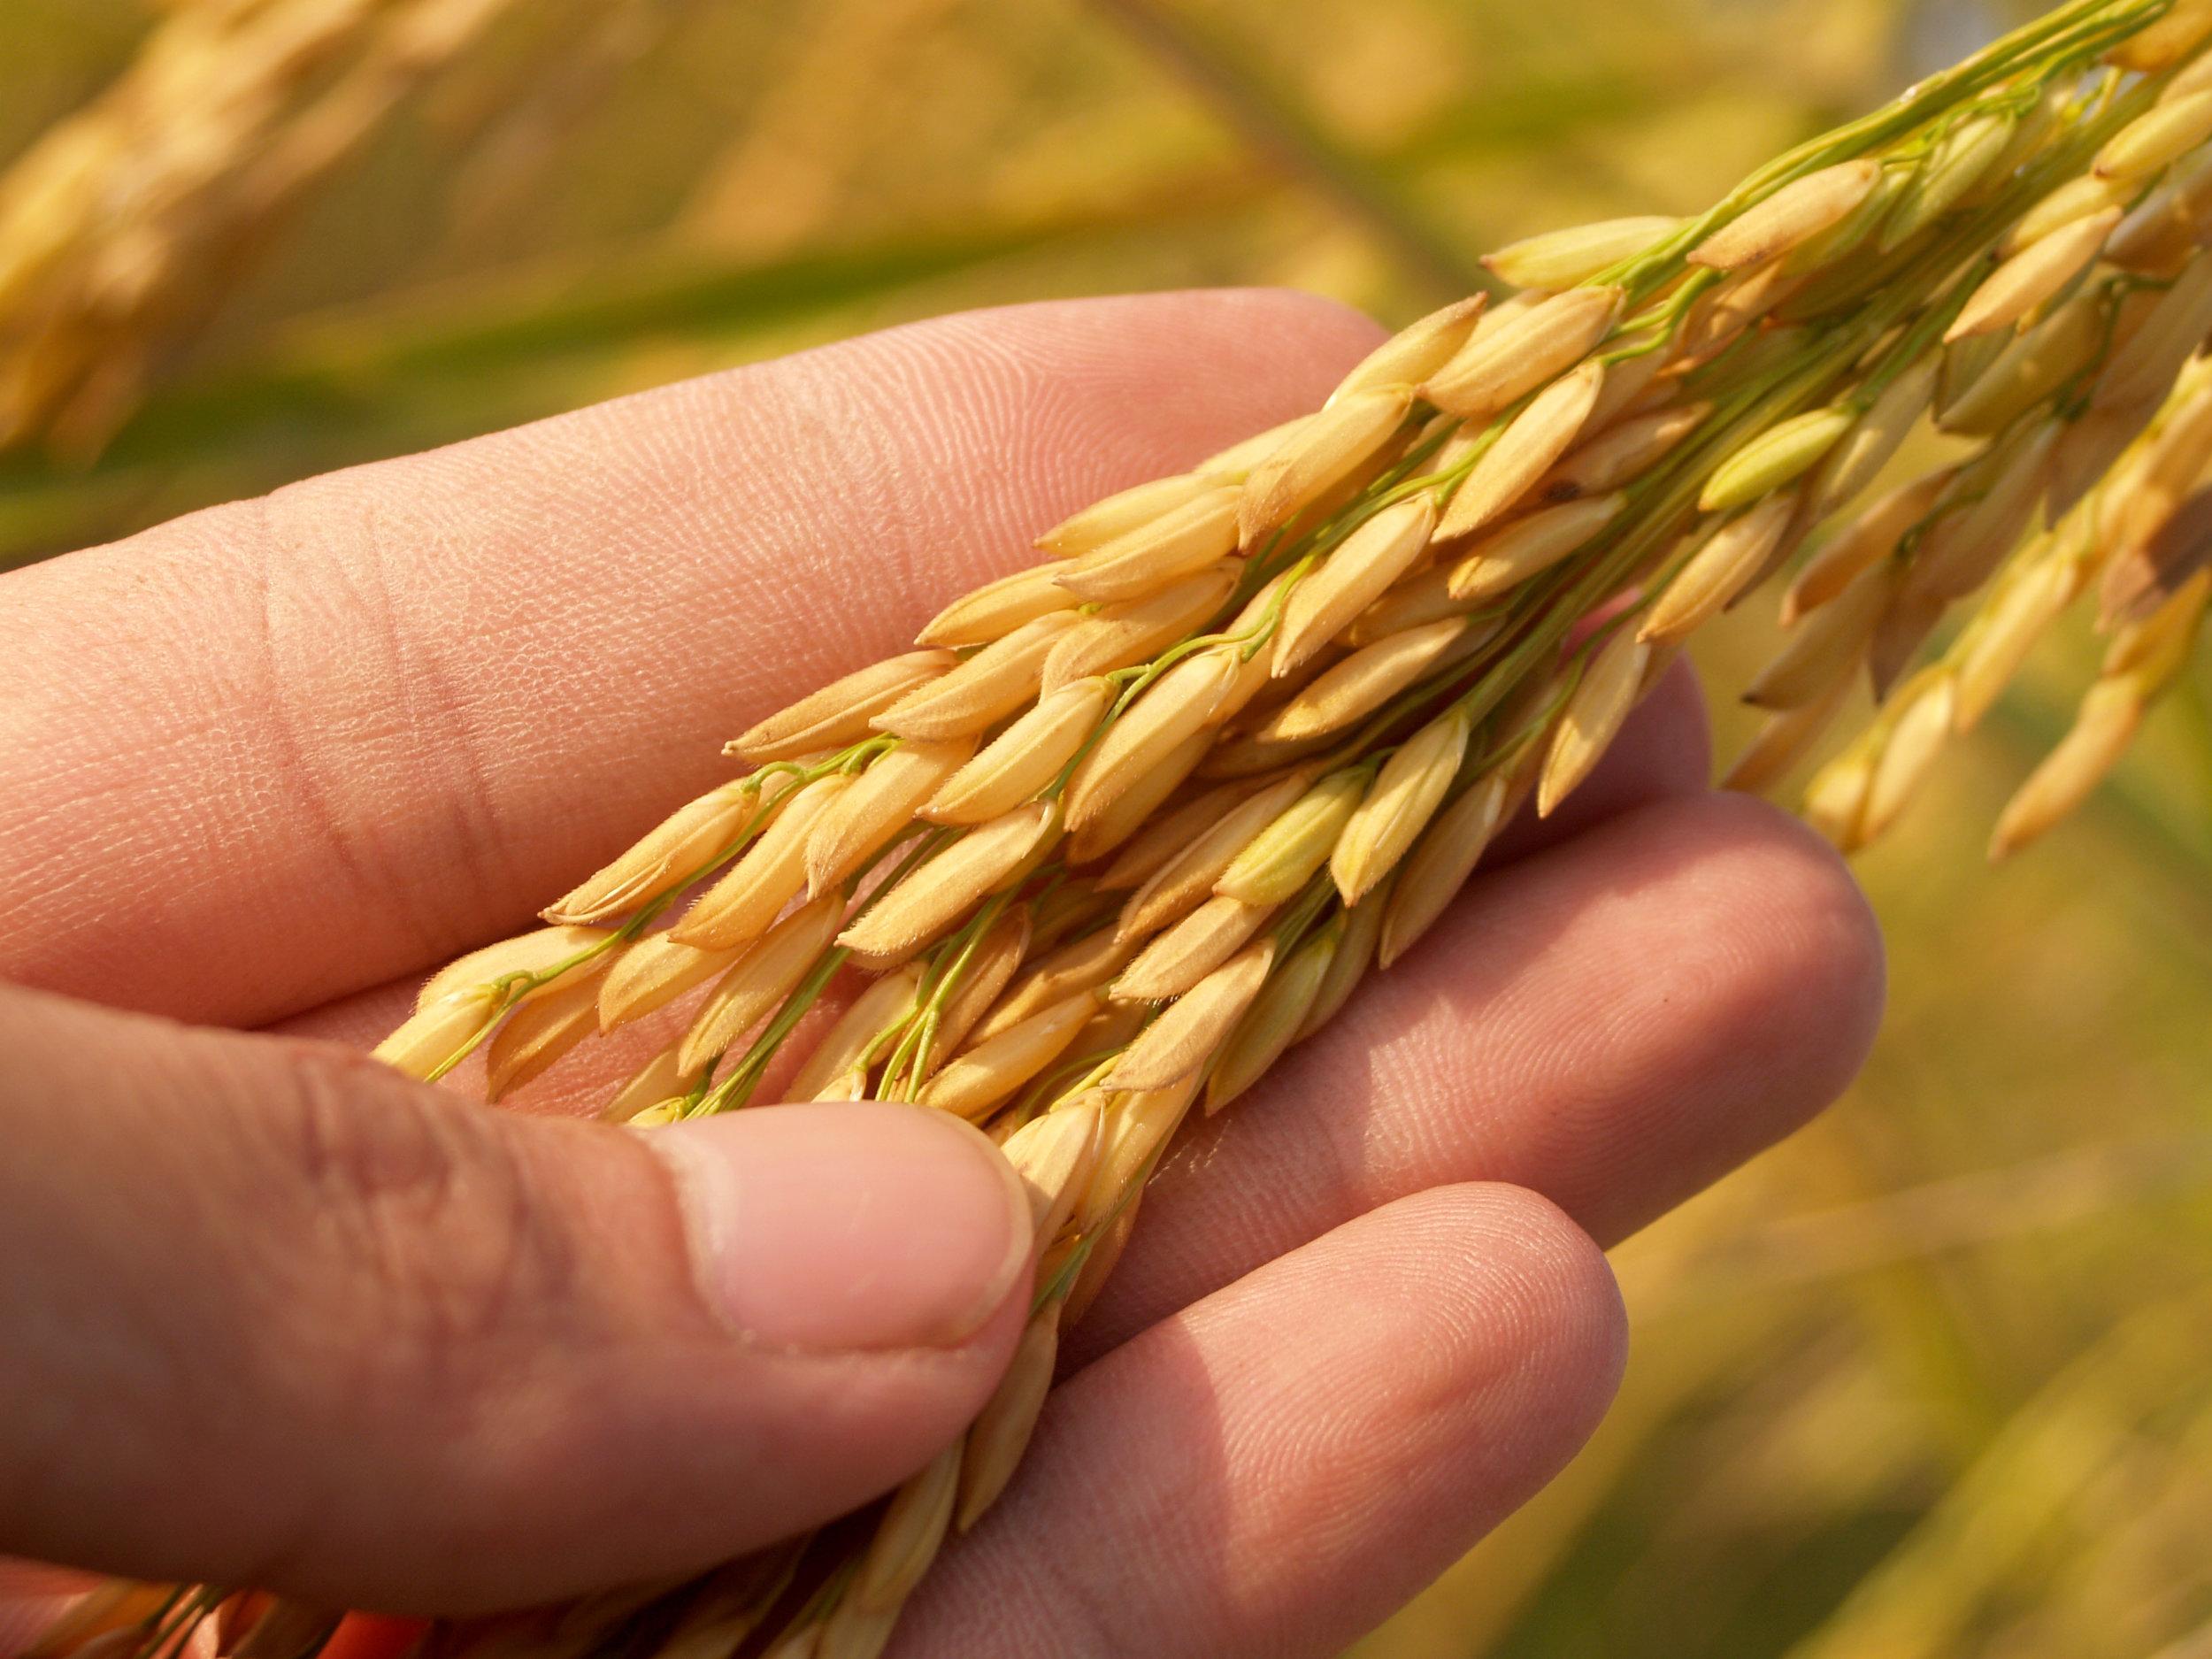 3 Wheat in Hand.jpeg